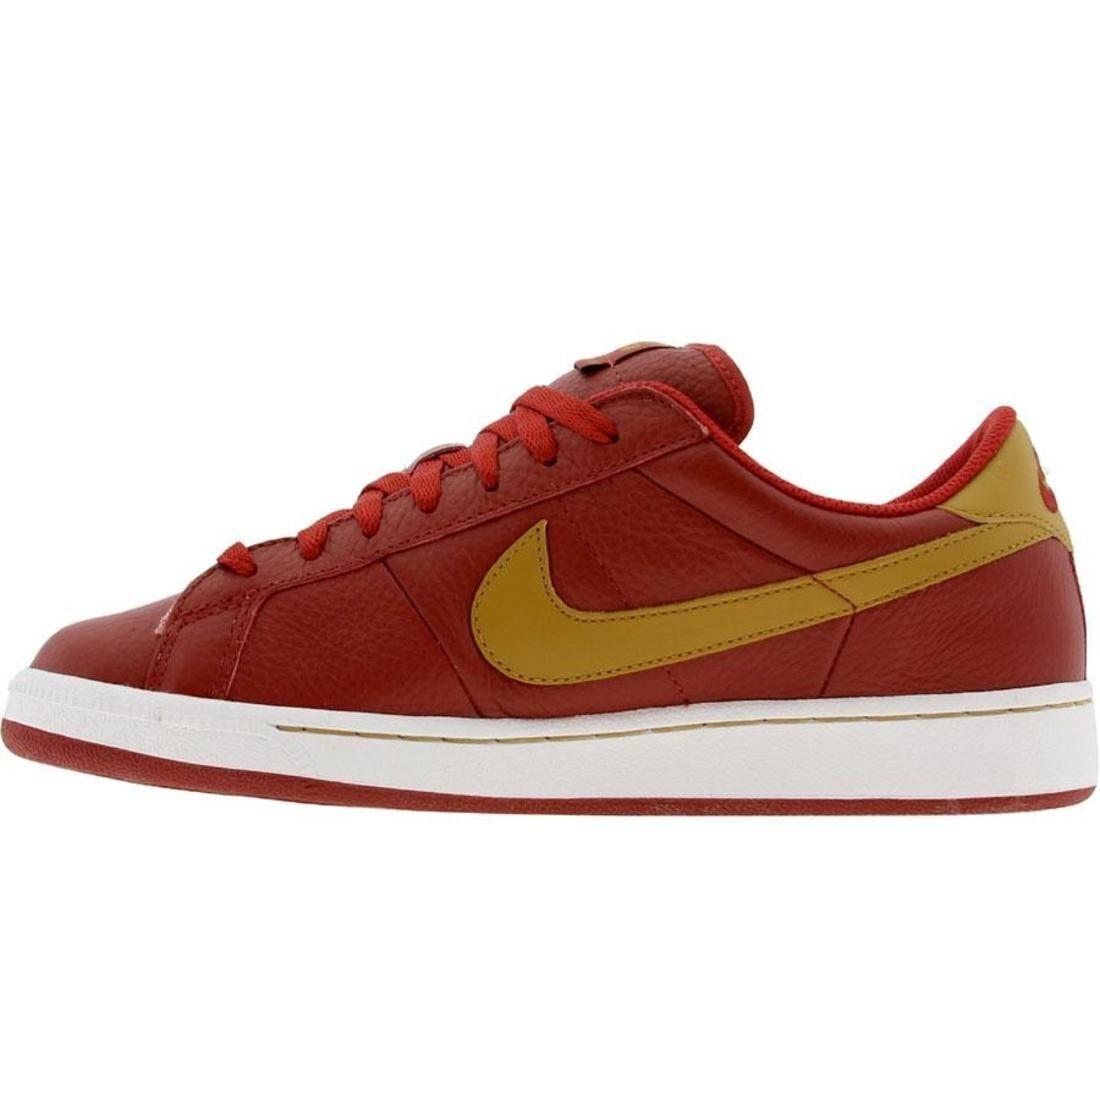 Nike Air barato Classic SB oscuro Cayenne bronzine barato Air y hermoso moda 9b5b7d